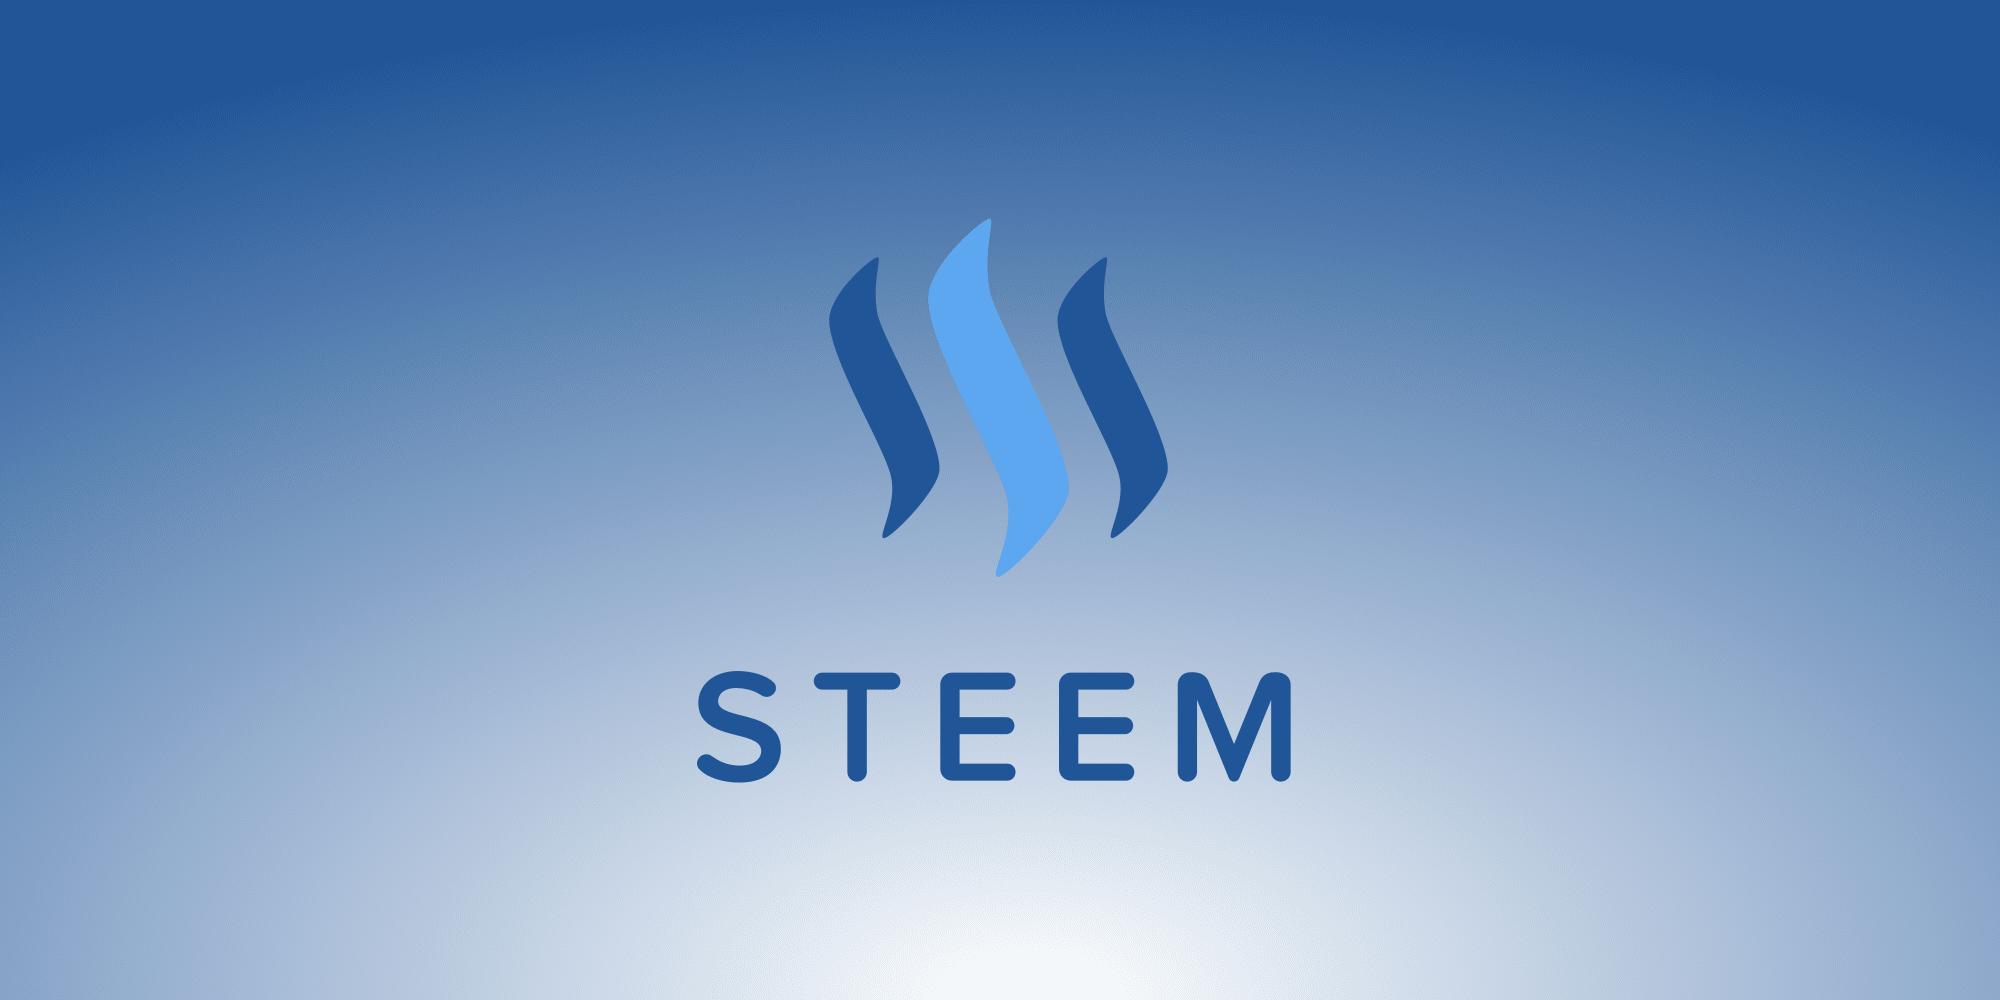 Onde comprar Steem - STEEM